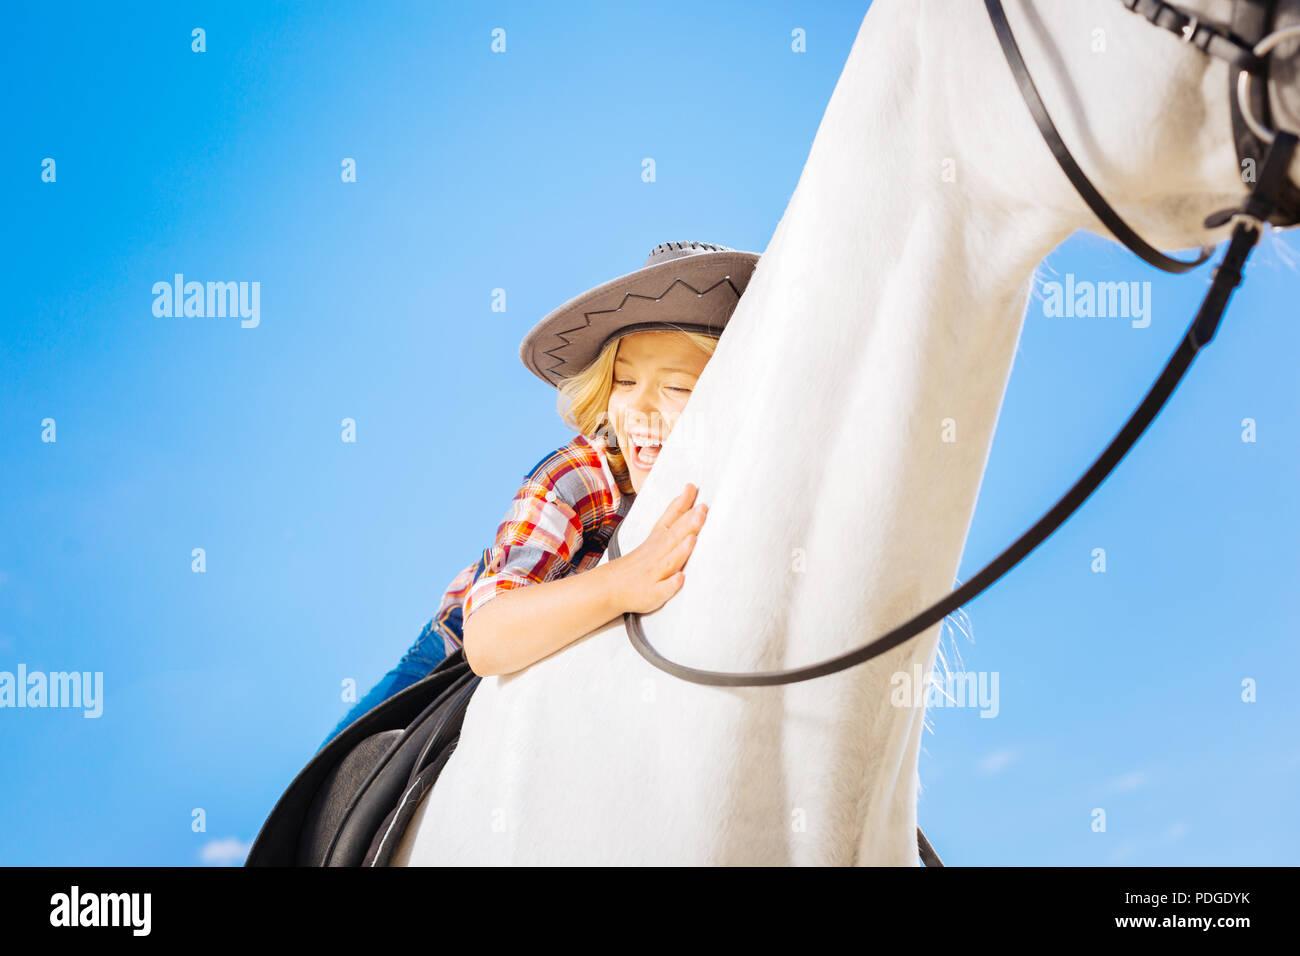 Aux cheveux blonds funny girl rire alors que son cheval Cheval blanc Photo Stock